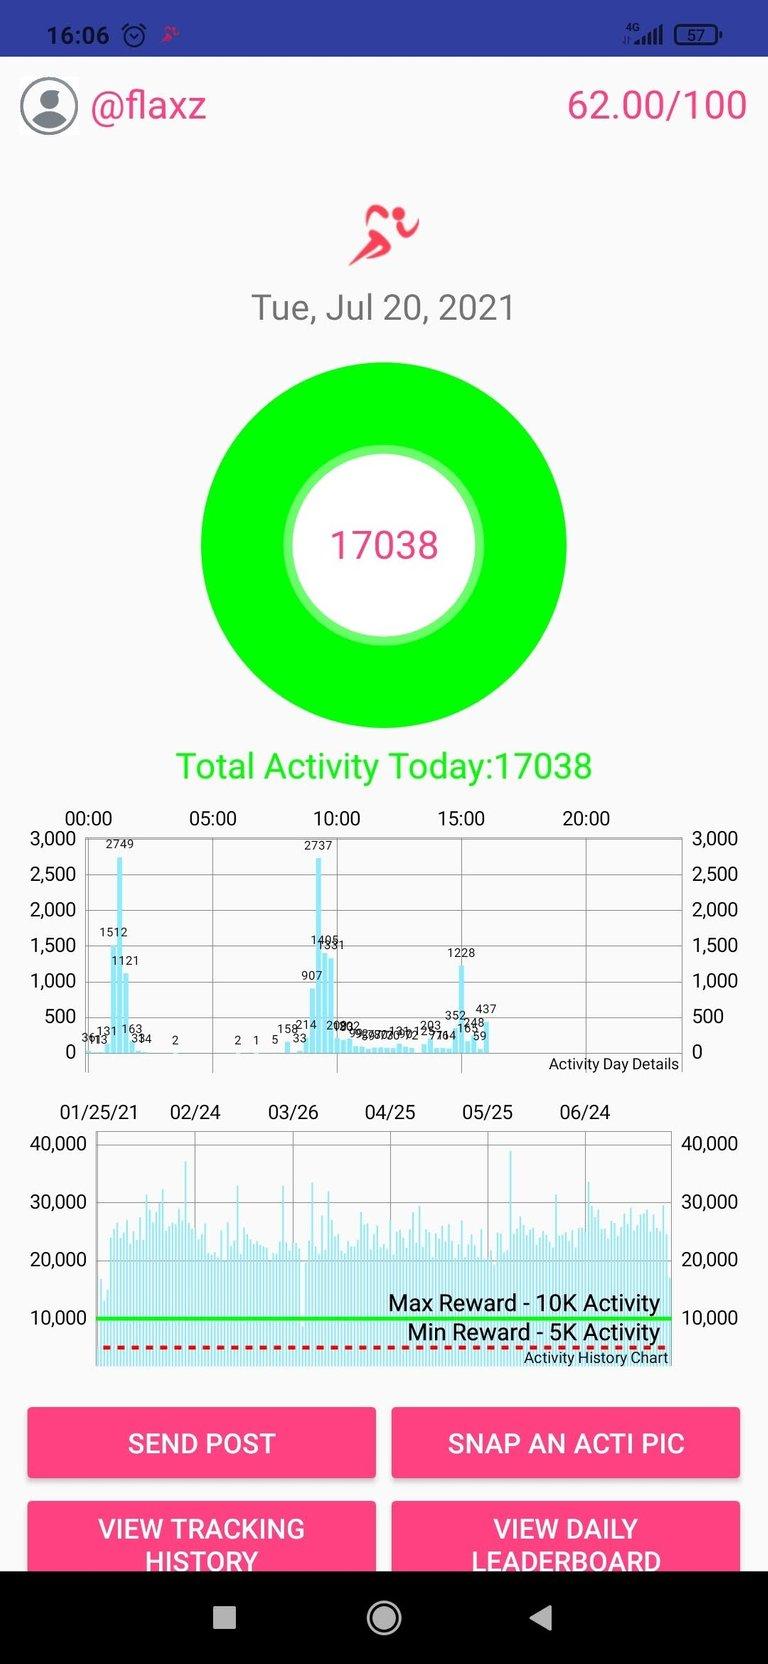 Screenshot_2021-07-20-16-06-41-587_io.actifit.fitnesstracker.actifitfitnesstracker.jpg